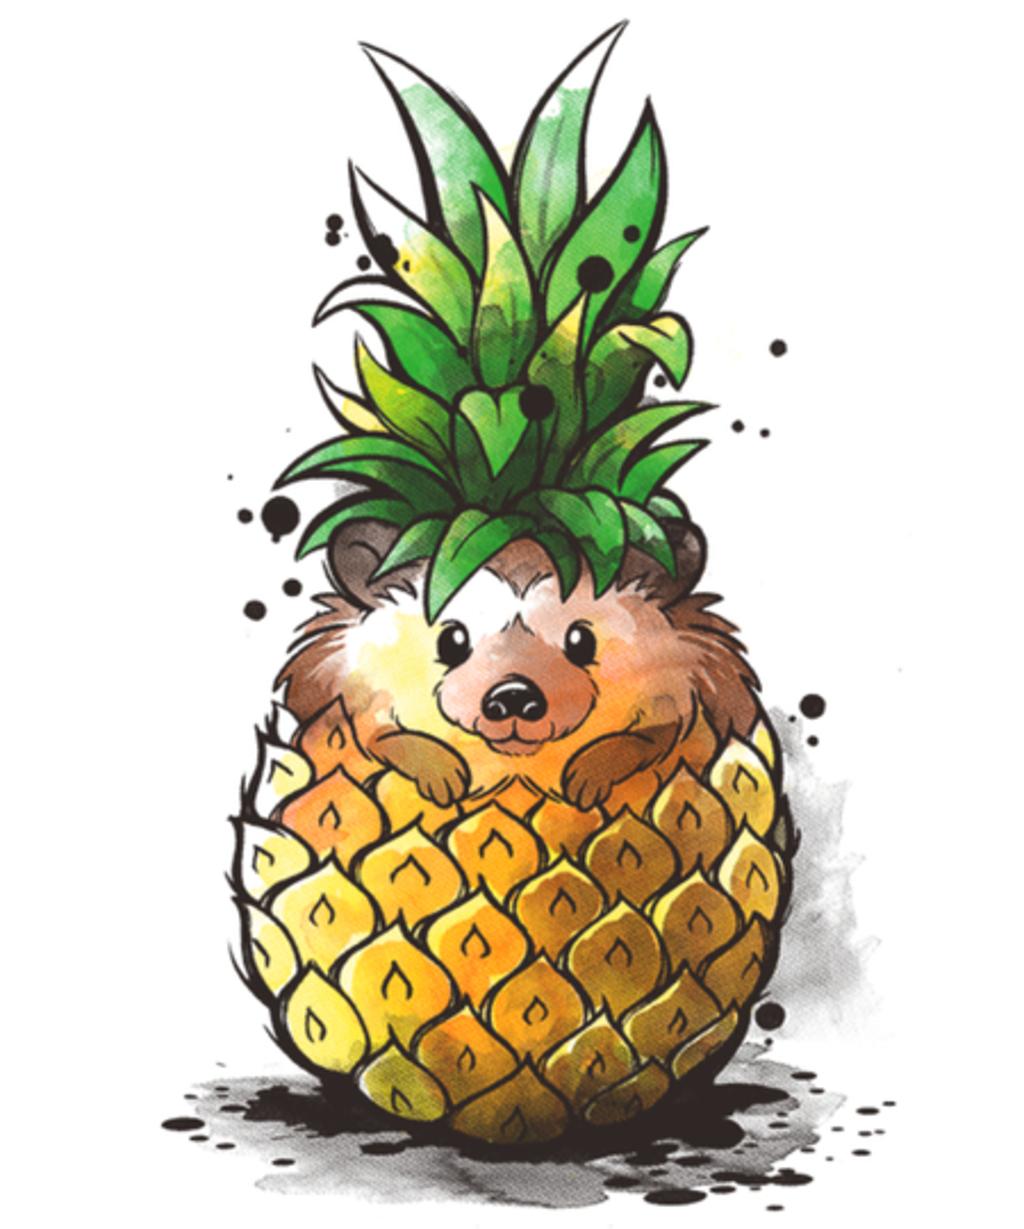 Qwertee: Pineapple hedgehog